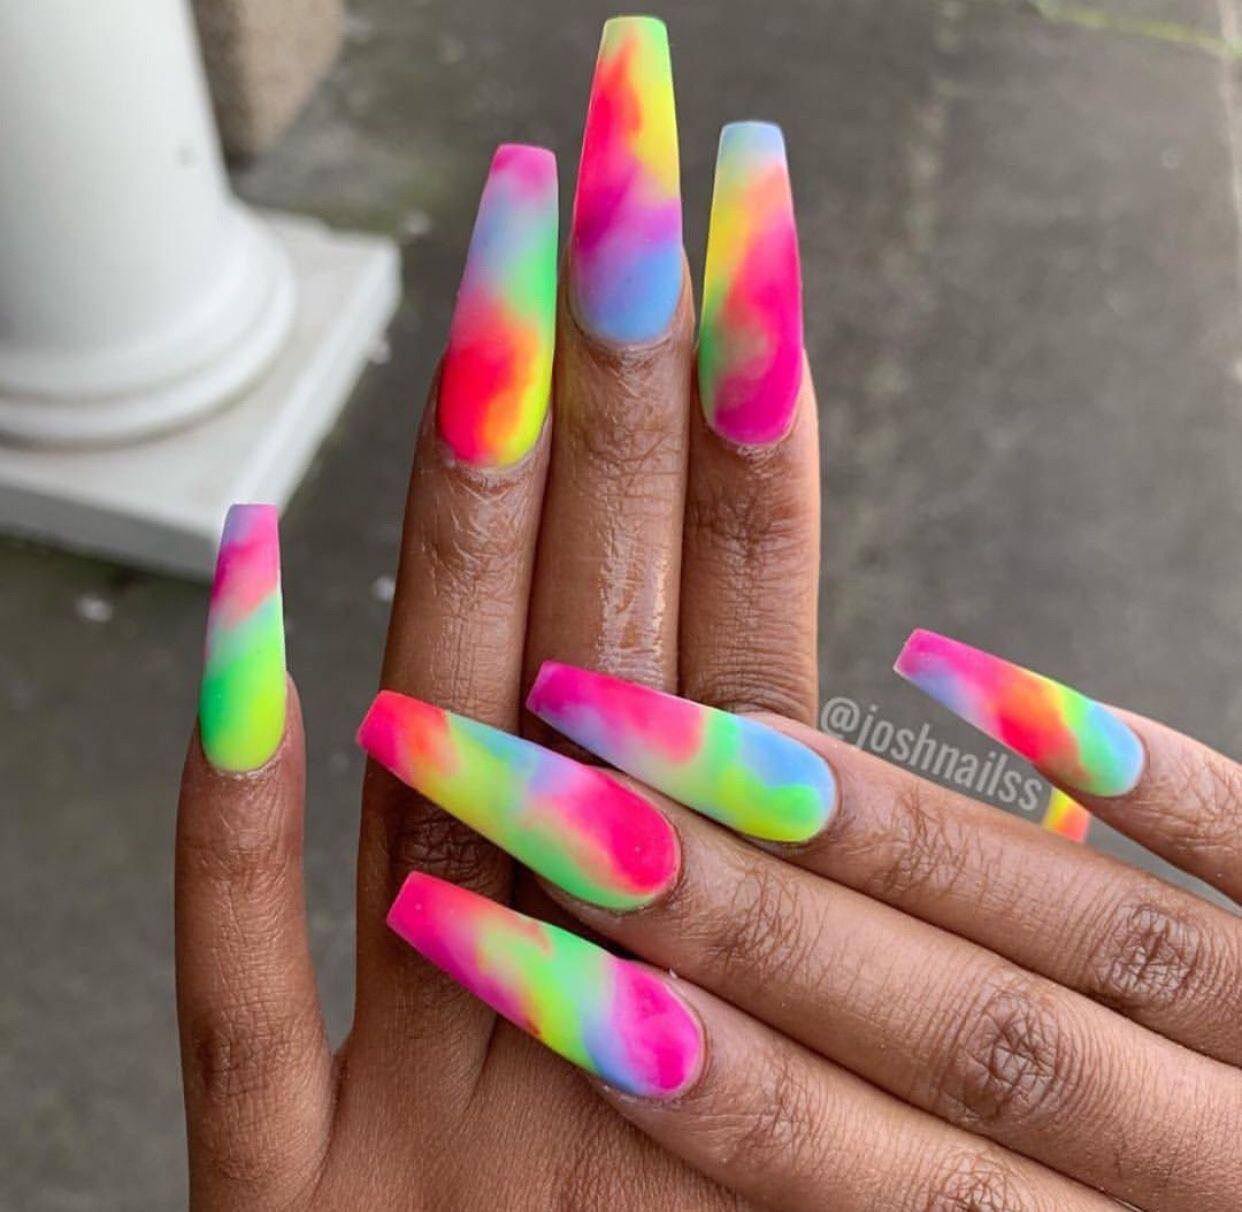 Pin by autumn 💕 on nails | Trendy nails, Cute acrylic nails, Long nails